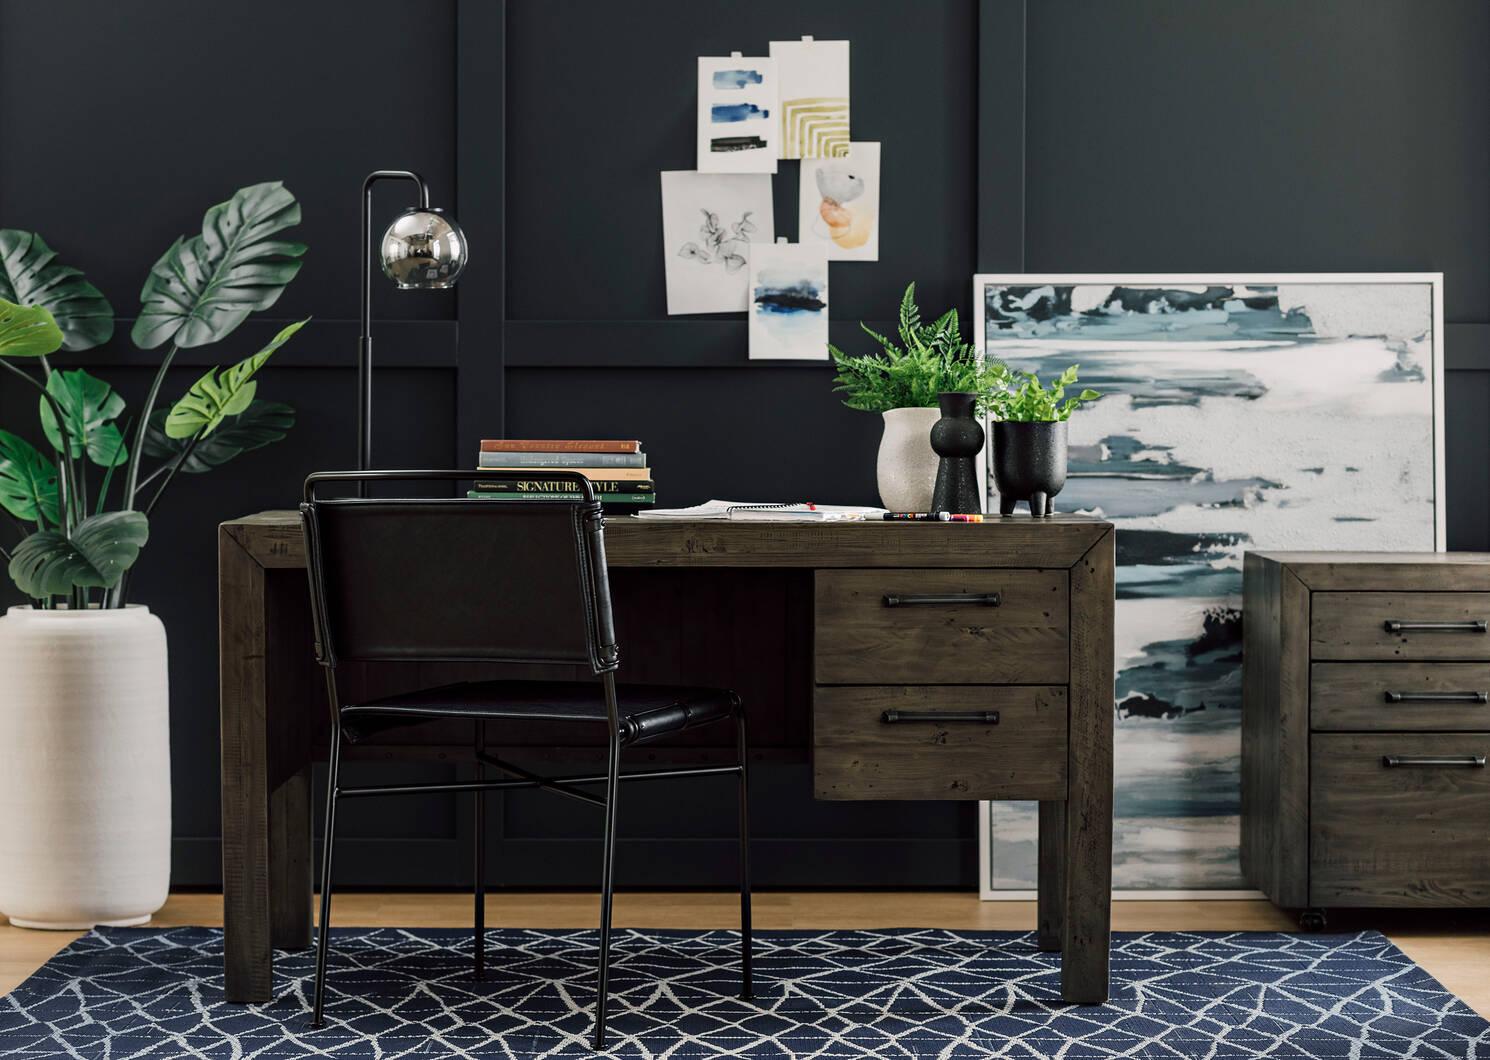 Emmory Dining Chair -Como Black